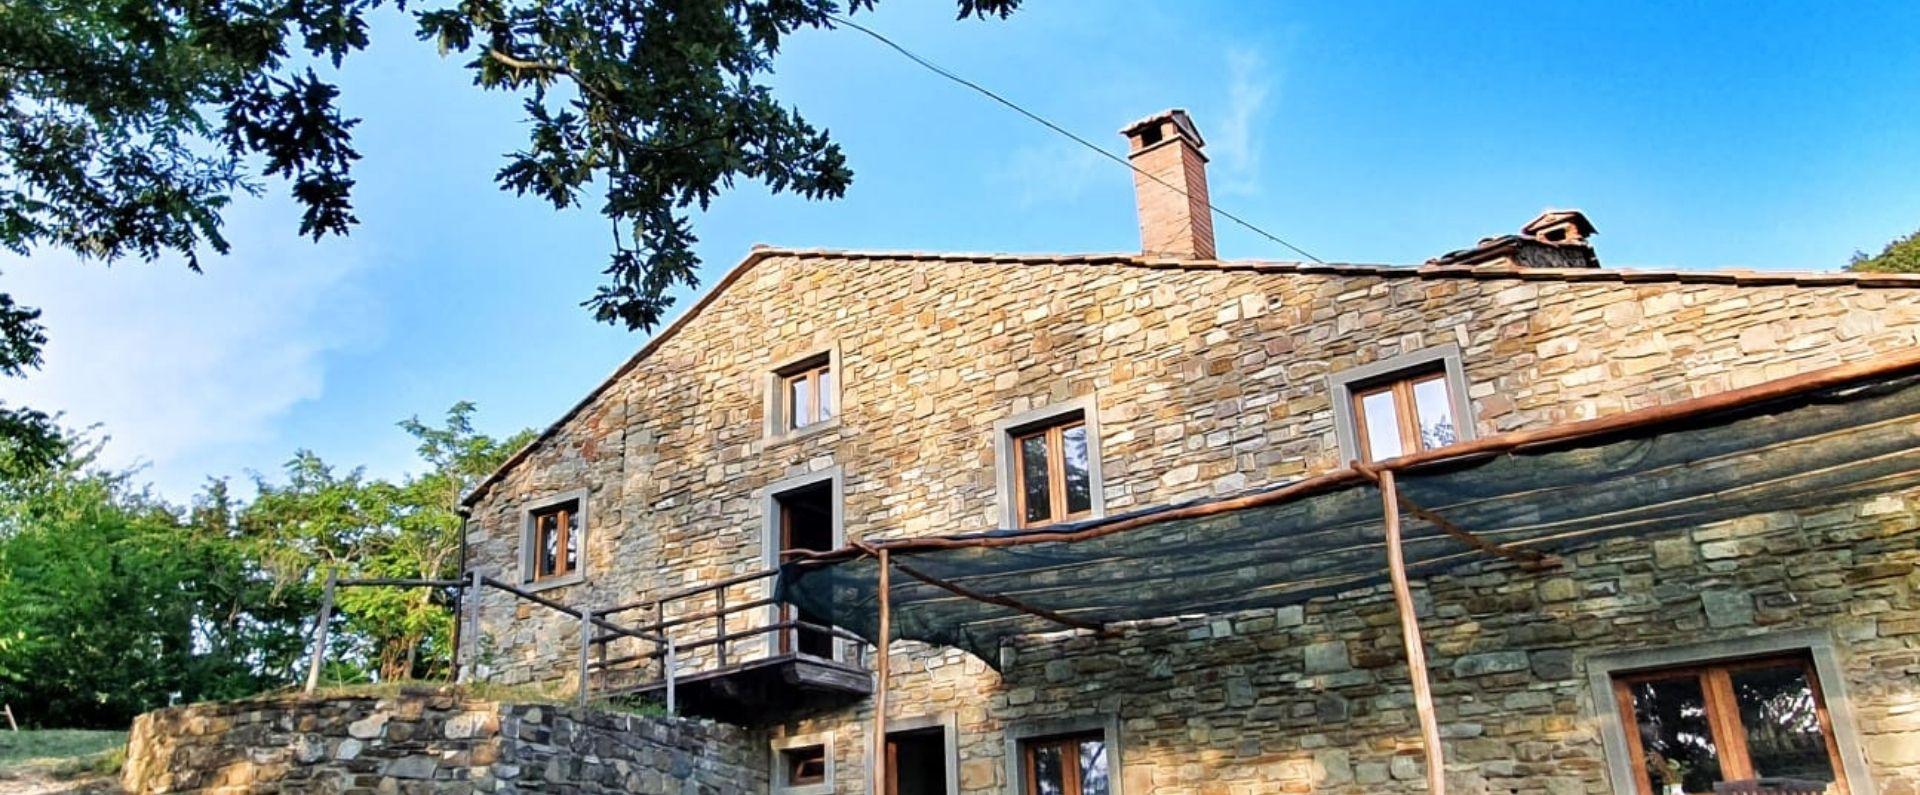 Agopuntura in Toscana